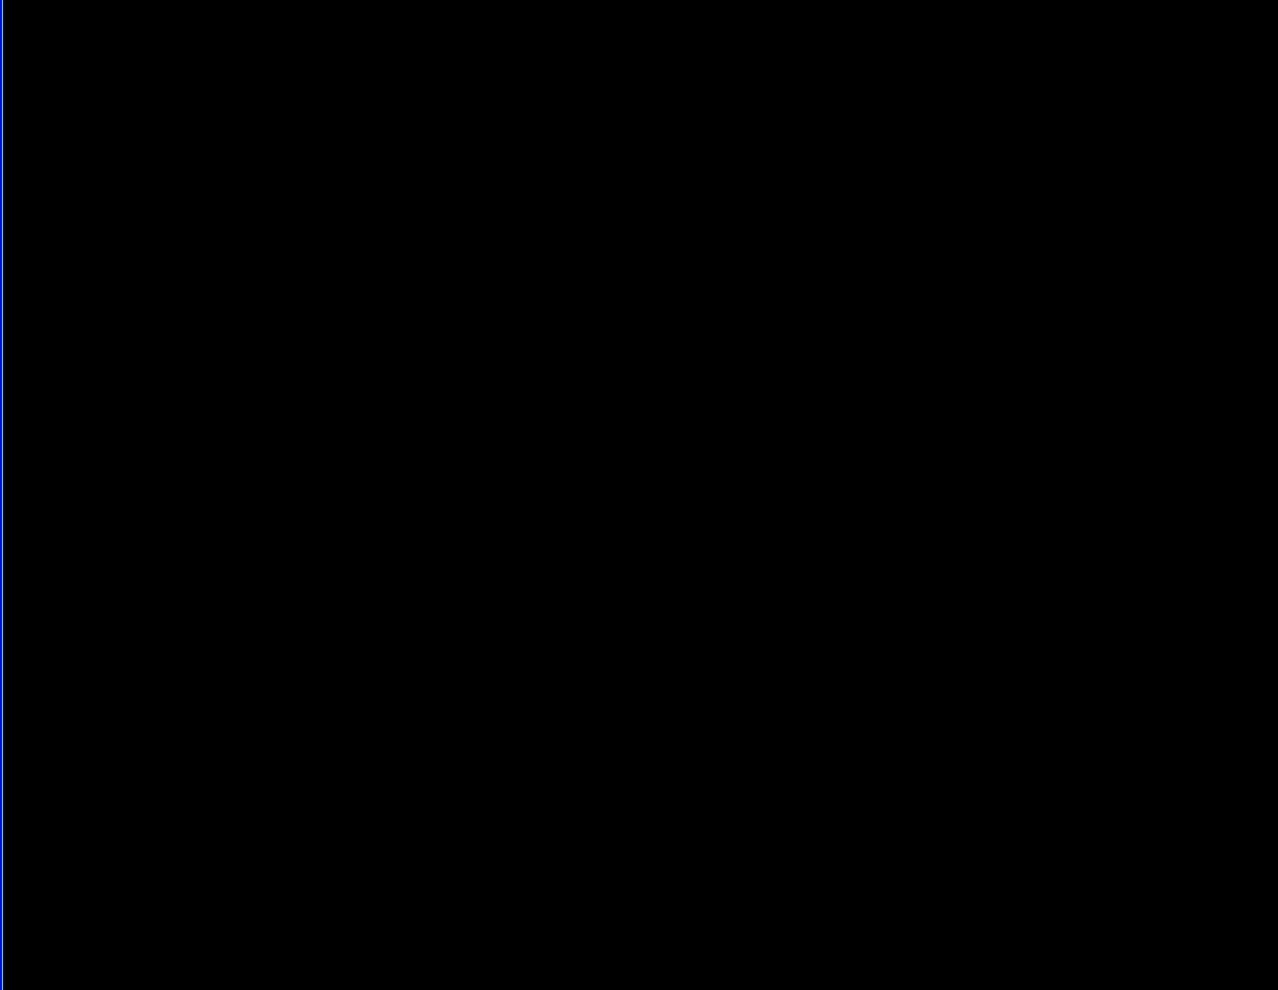 Pure Black Test Screen